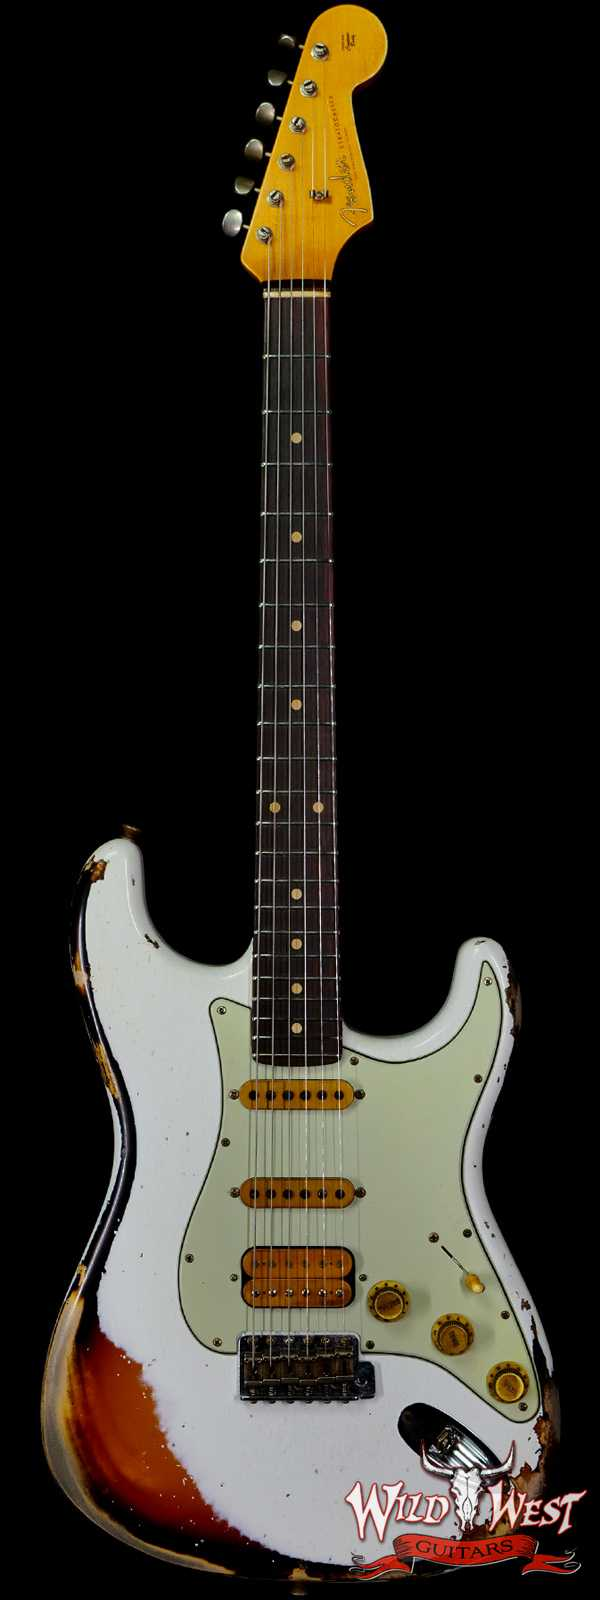 Fender Custom Shop Wild West White Lightning 2.0 Stratocaster HSS Heavy Relic Rosewood Board 22 Frets 3 Tone Sunburst